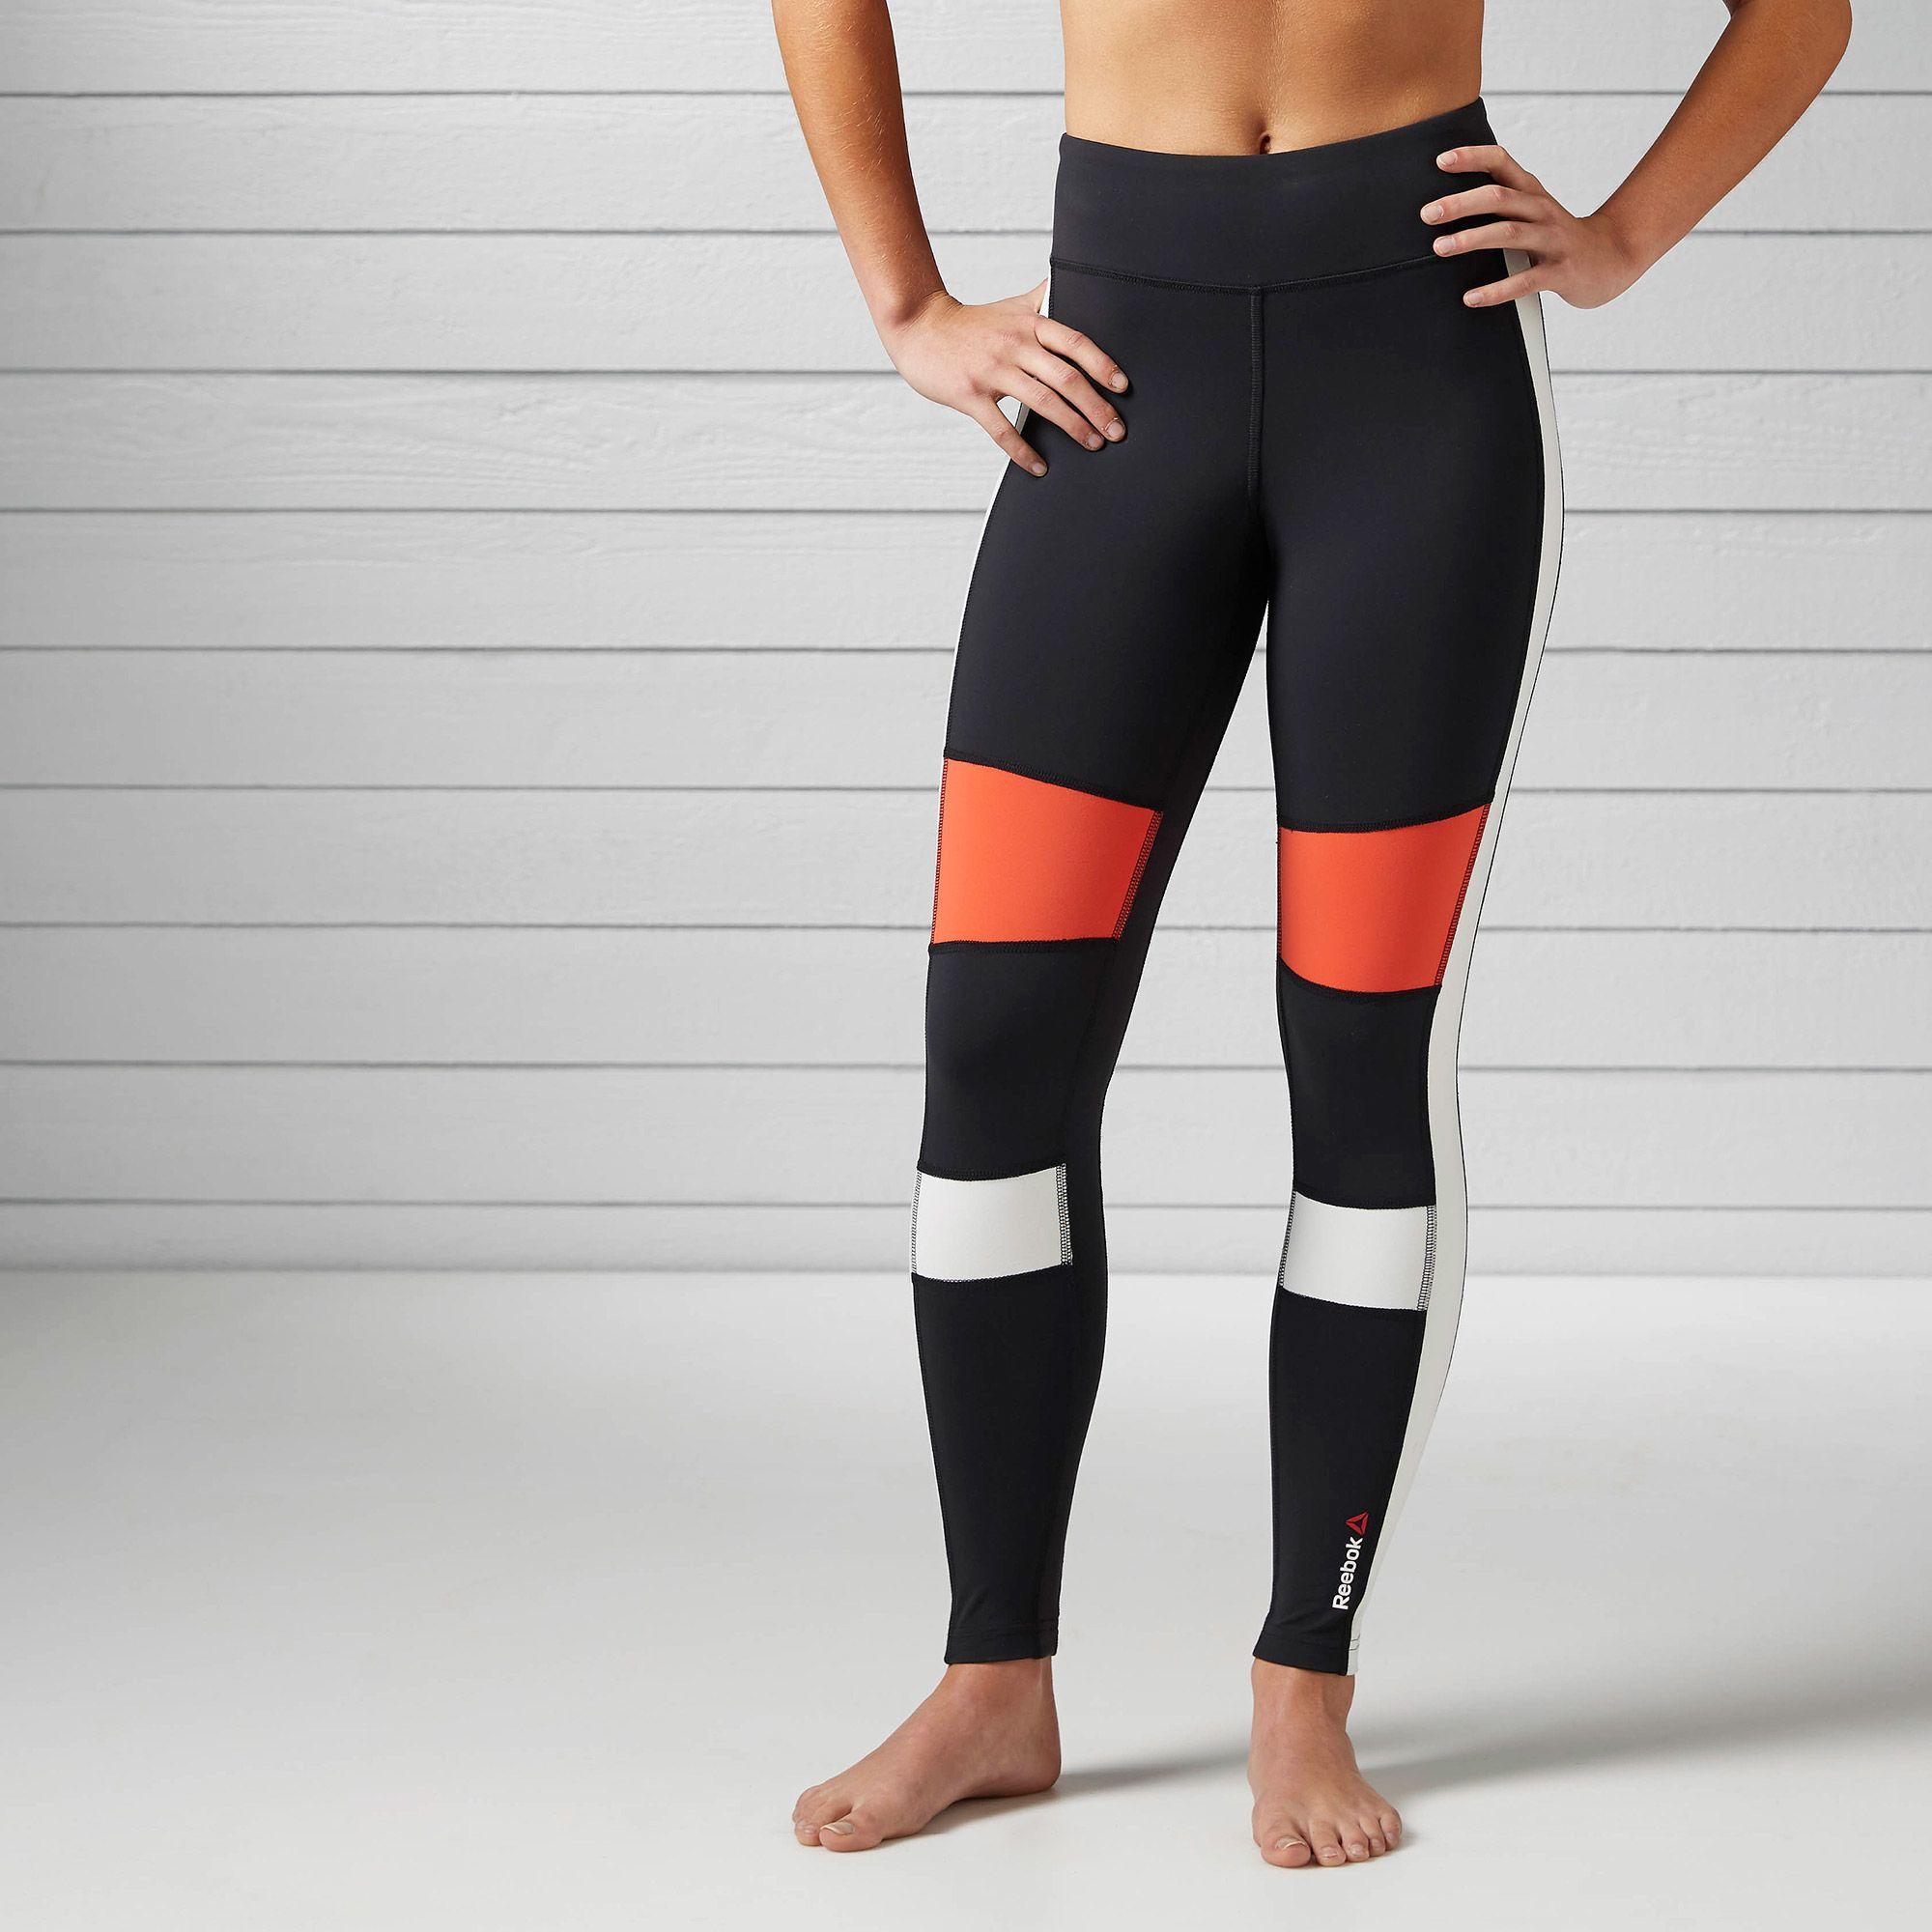 523f5b2878b2d9 Reebok - Women's Speedwick Colour Block Legging   Leggings   Reebok ...